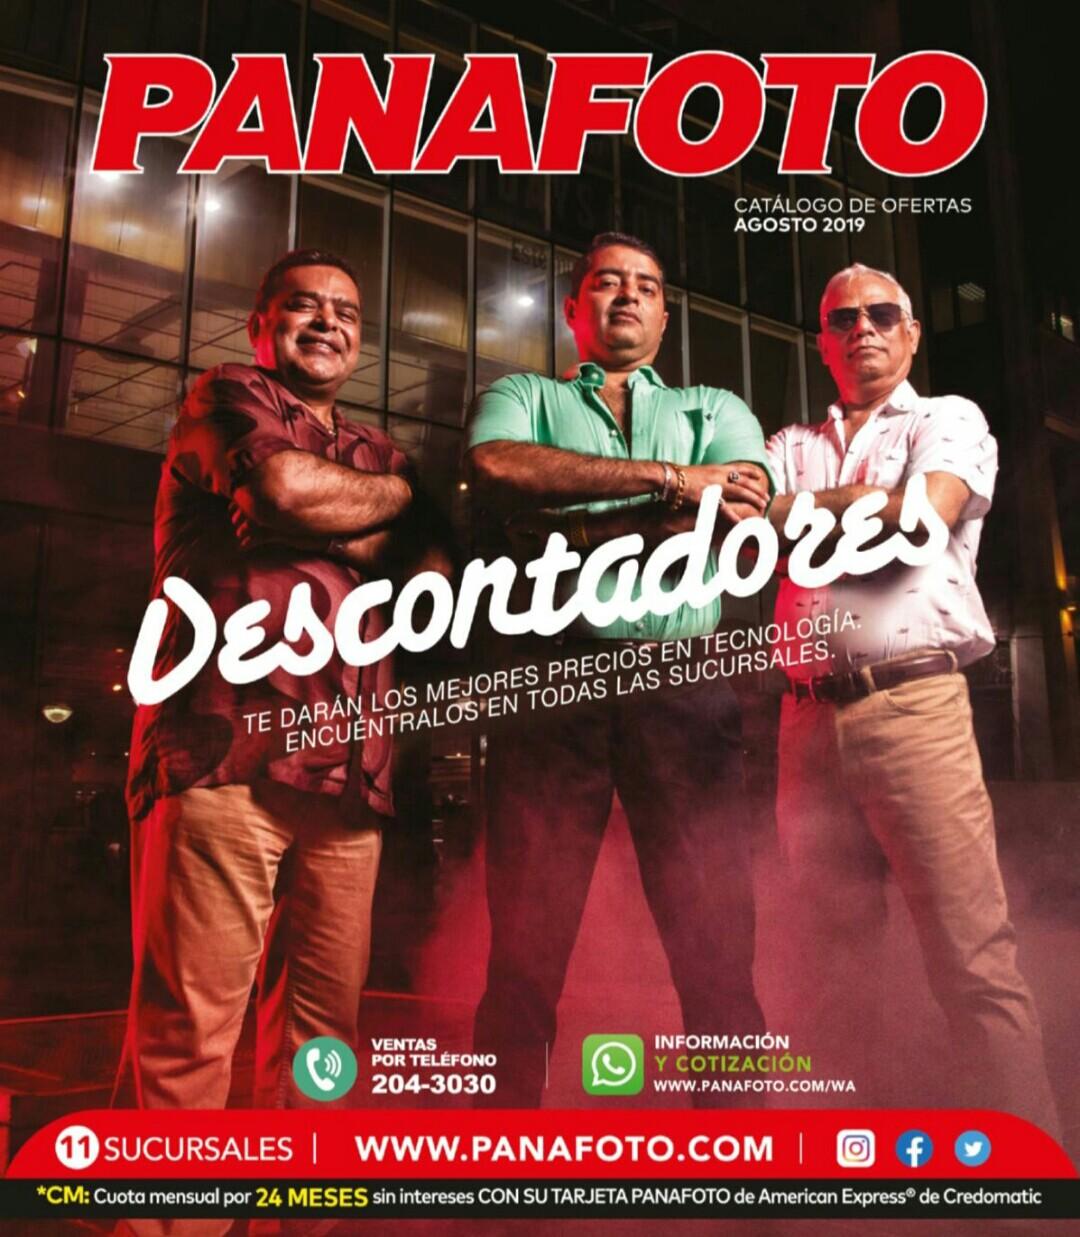 Catalogo Panafoto Agosto 2019 p1